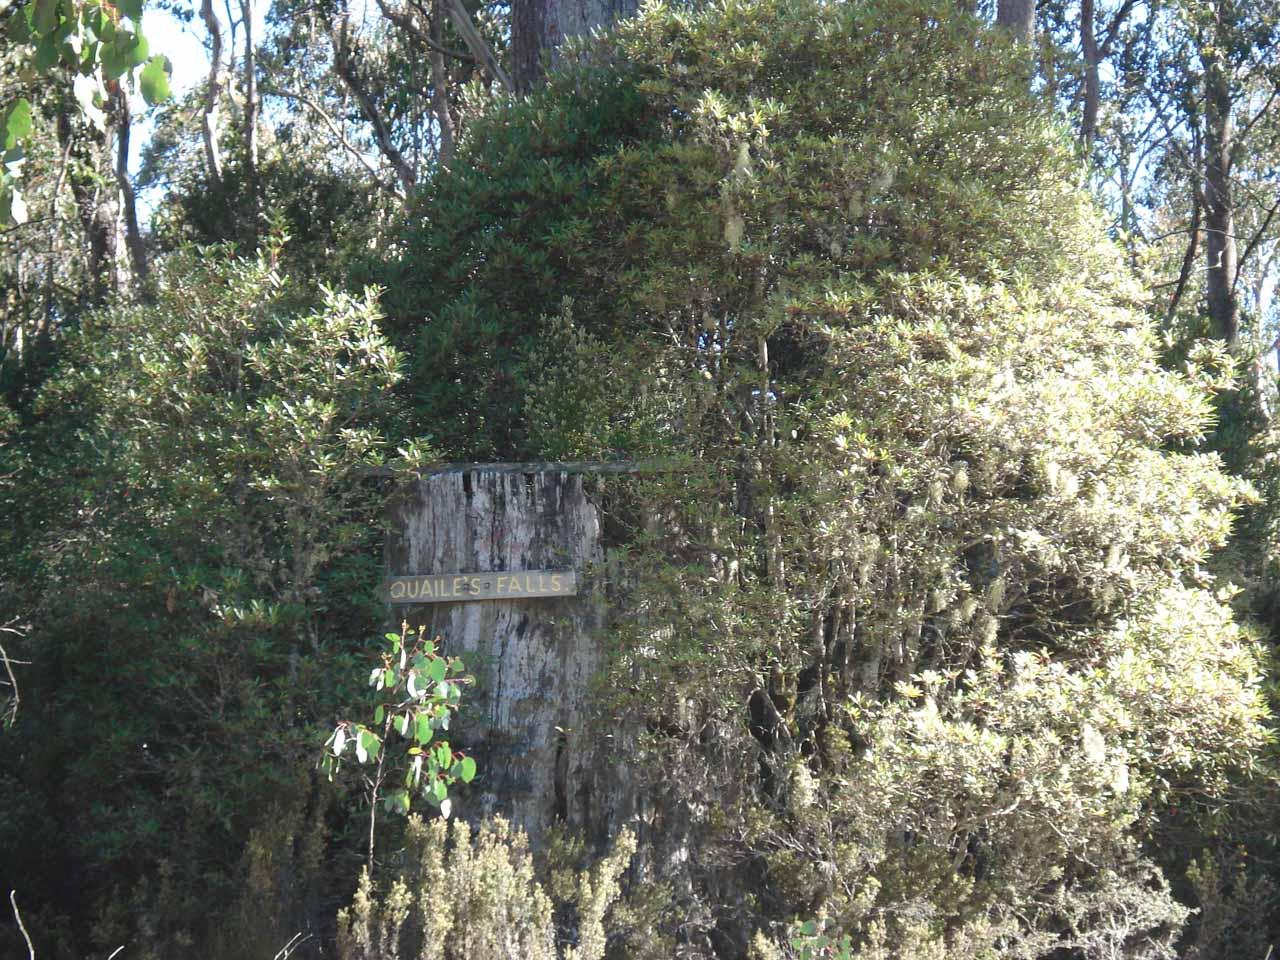 A sign for Quailes Falls